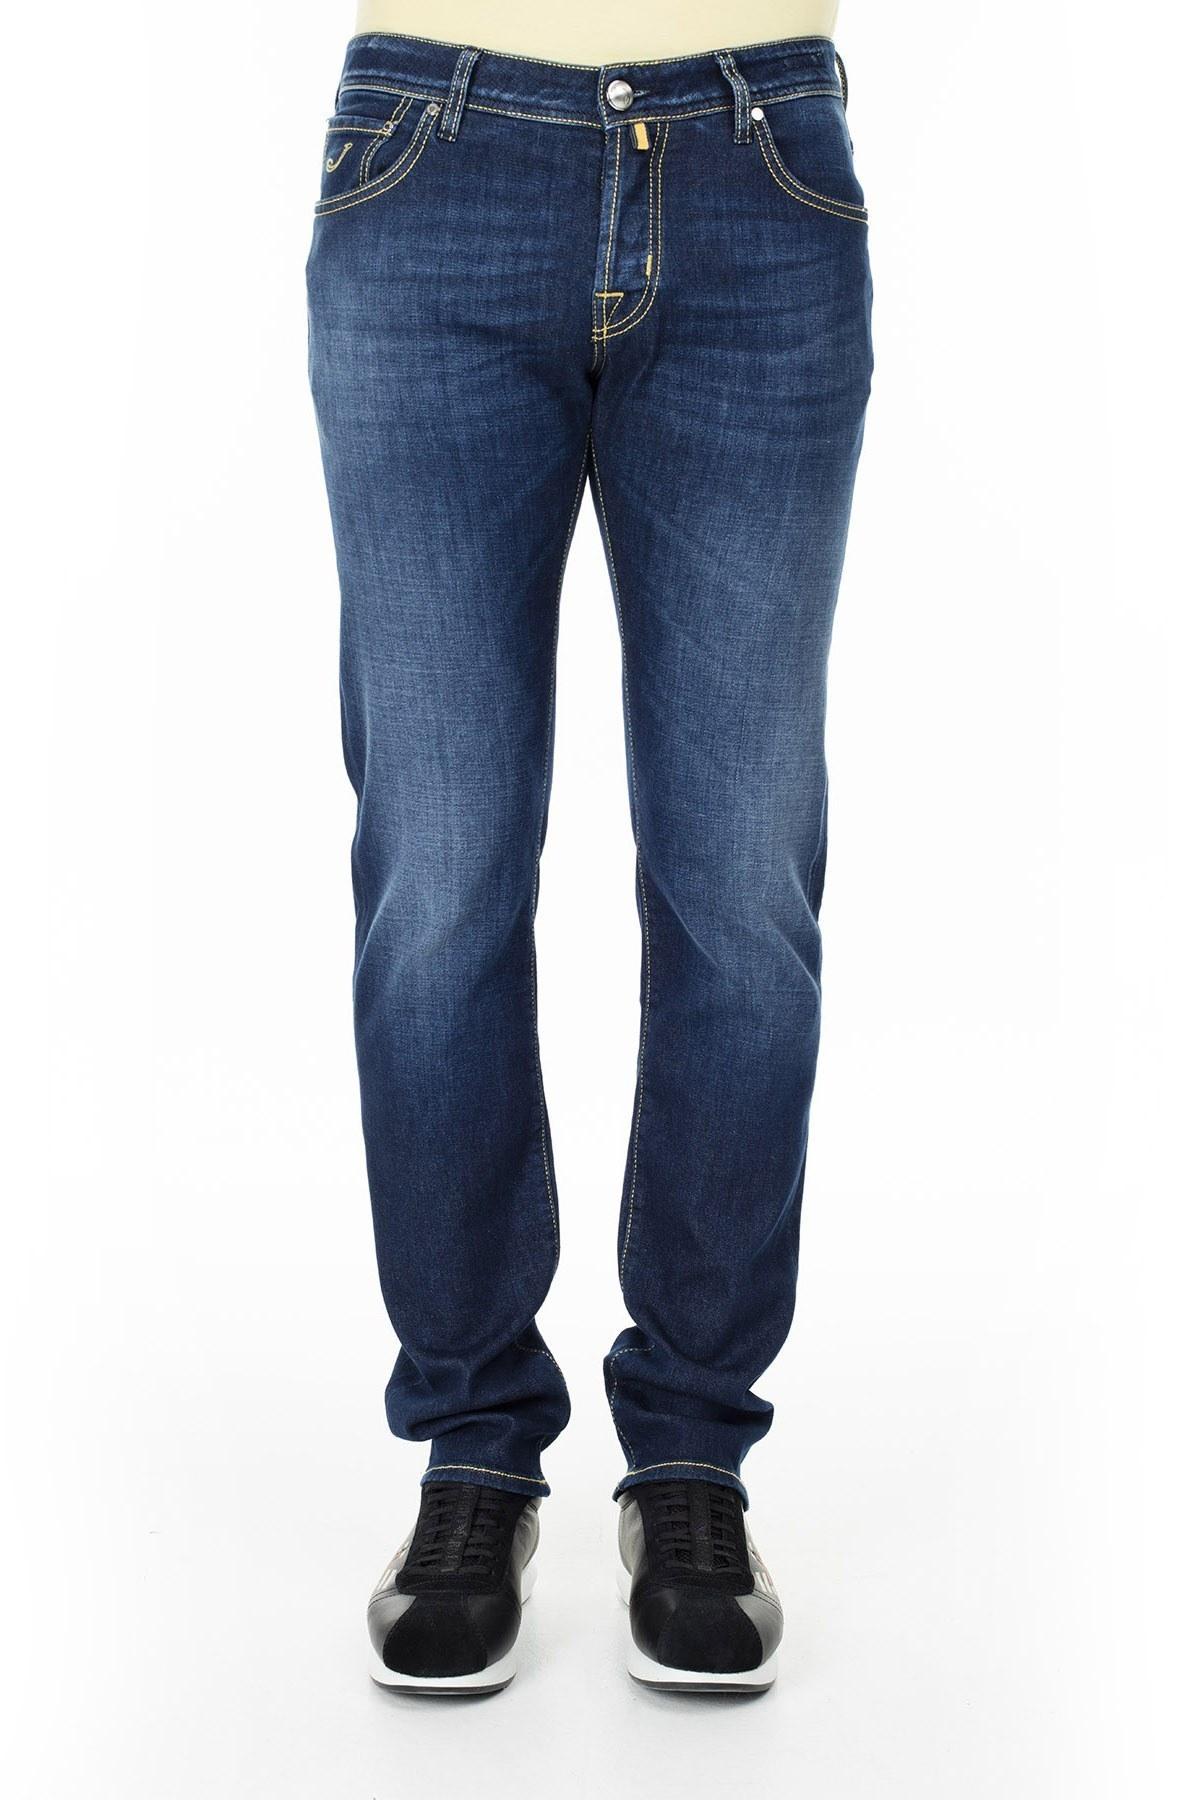 Jacob Cohen Jeans Erkek Kot Pantolon J622 919W1 001 LACİVERT